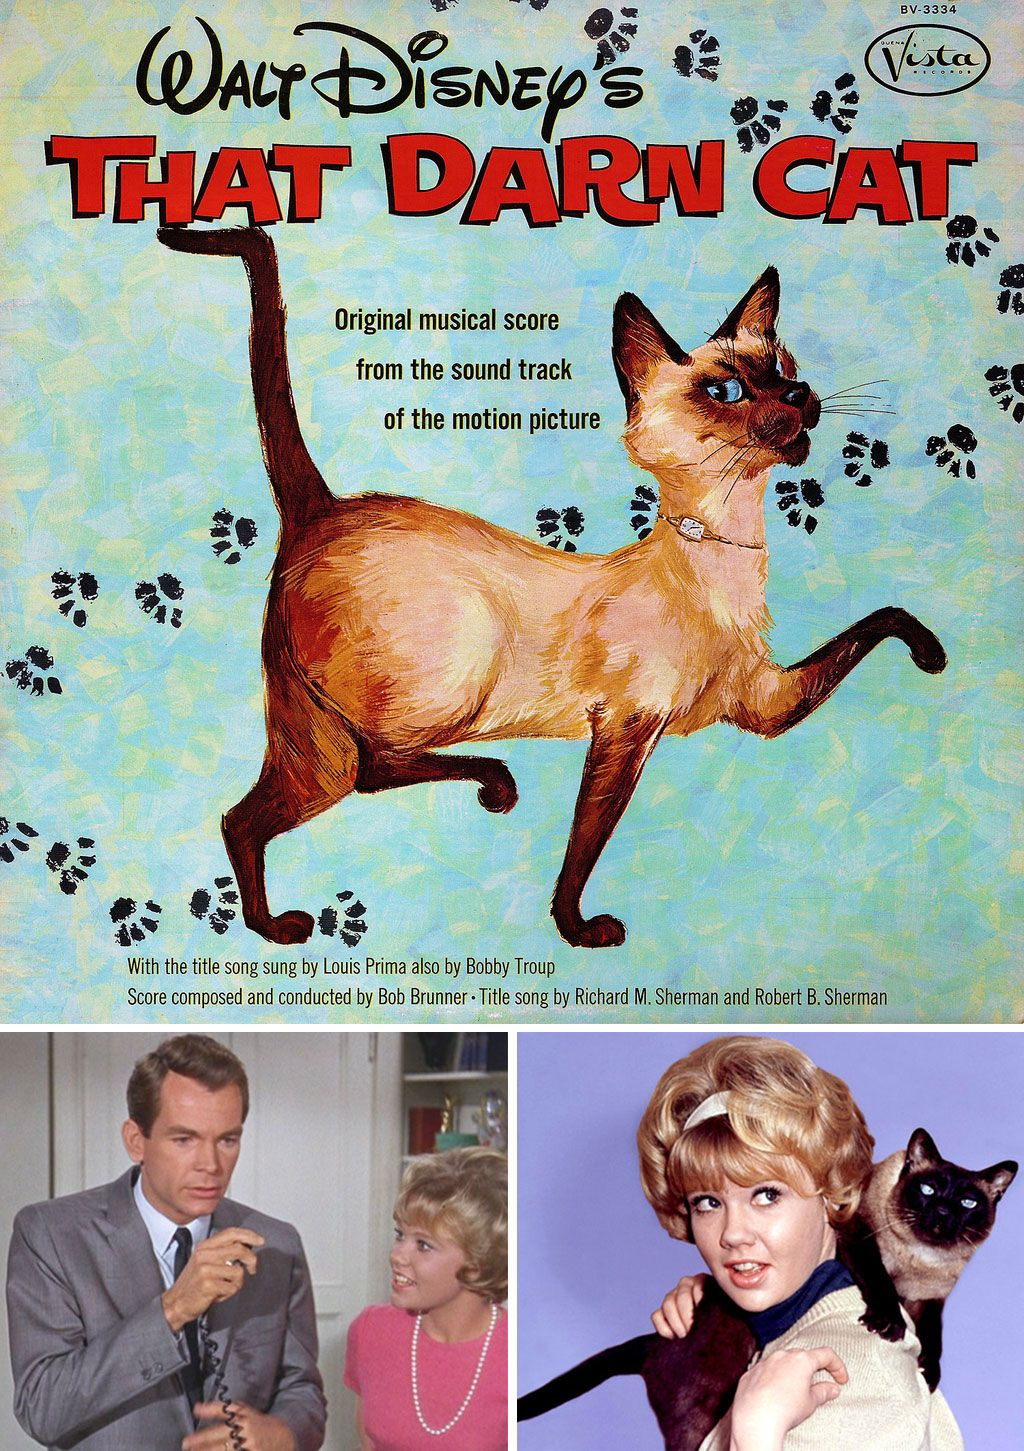 Walt Disney's That Darn Cat! (1965) starring Hayley Mills